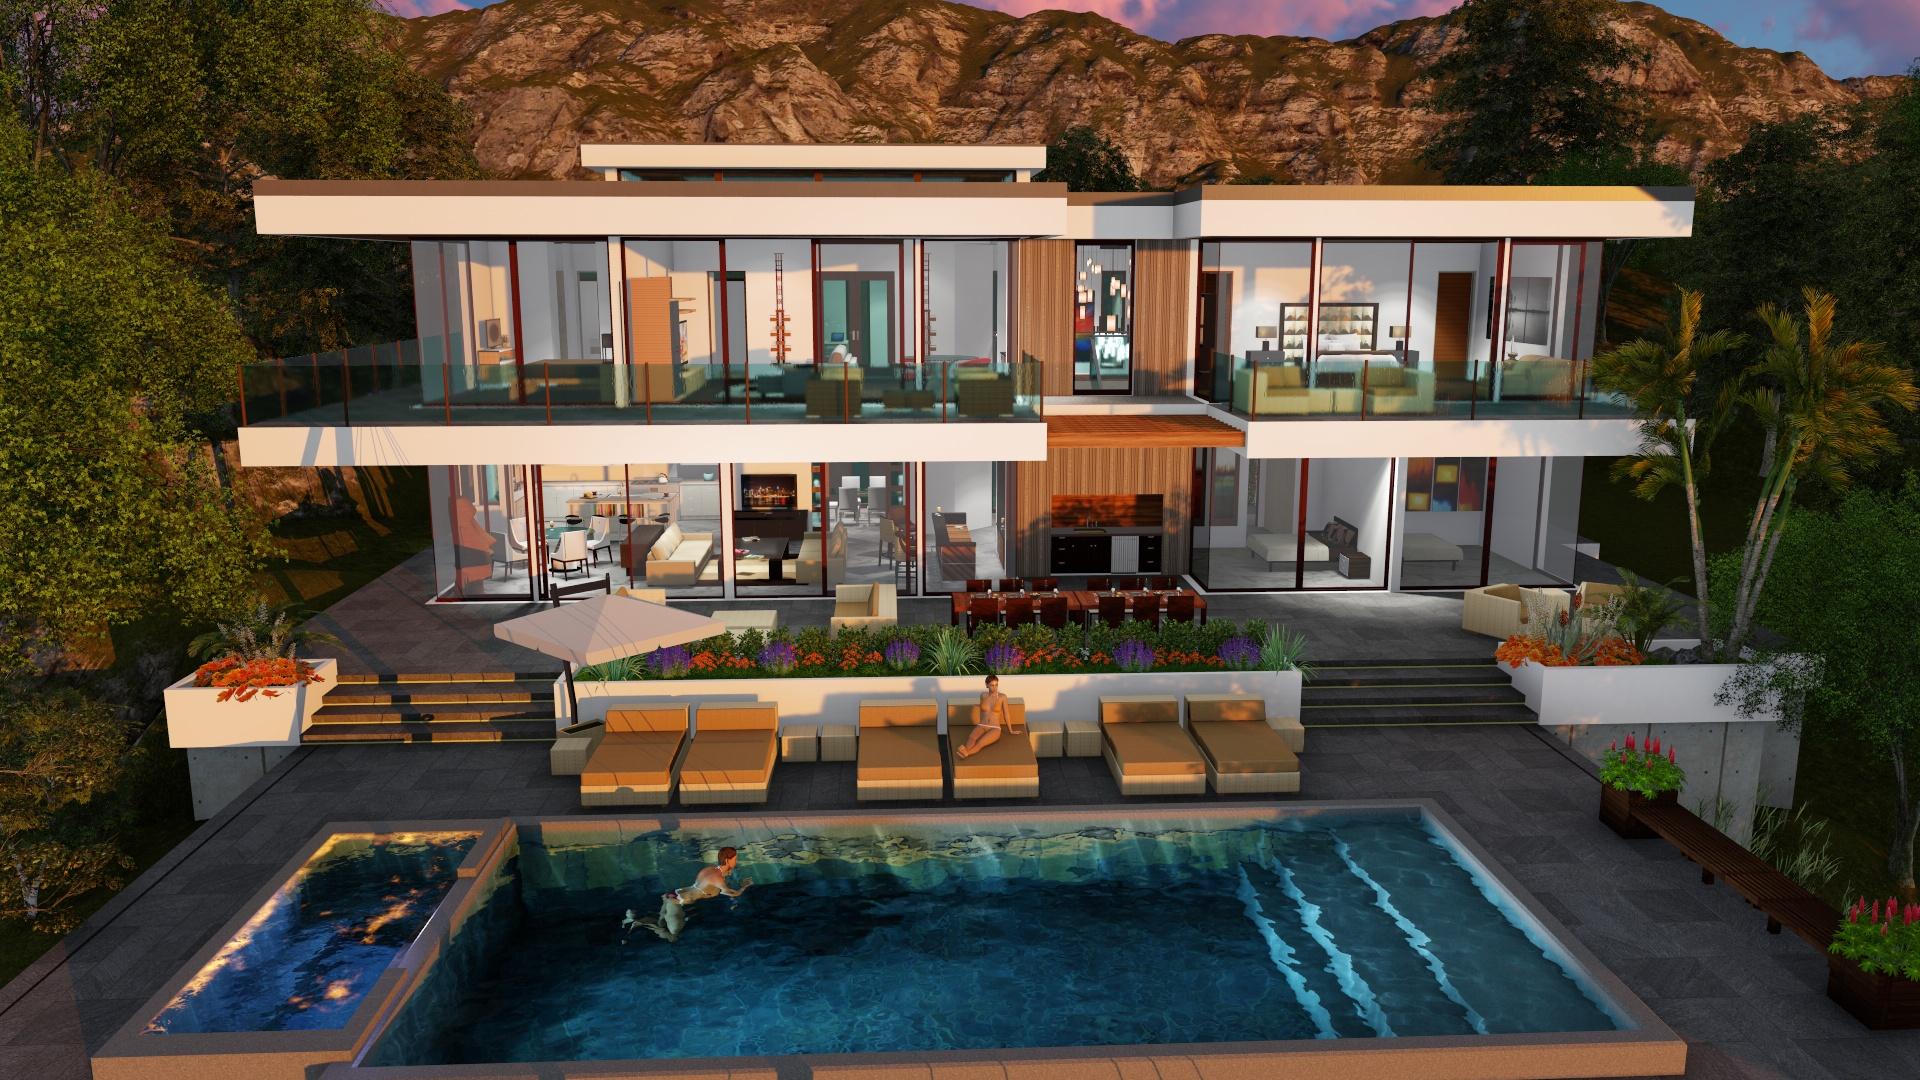 TWO STORY MODERN GLASS HOME DESIGN - Gallery - Next Gen ... on Modern Glass House Design  id=11732